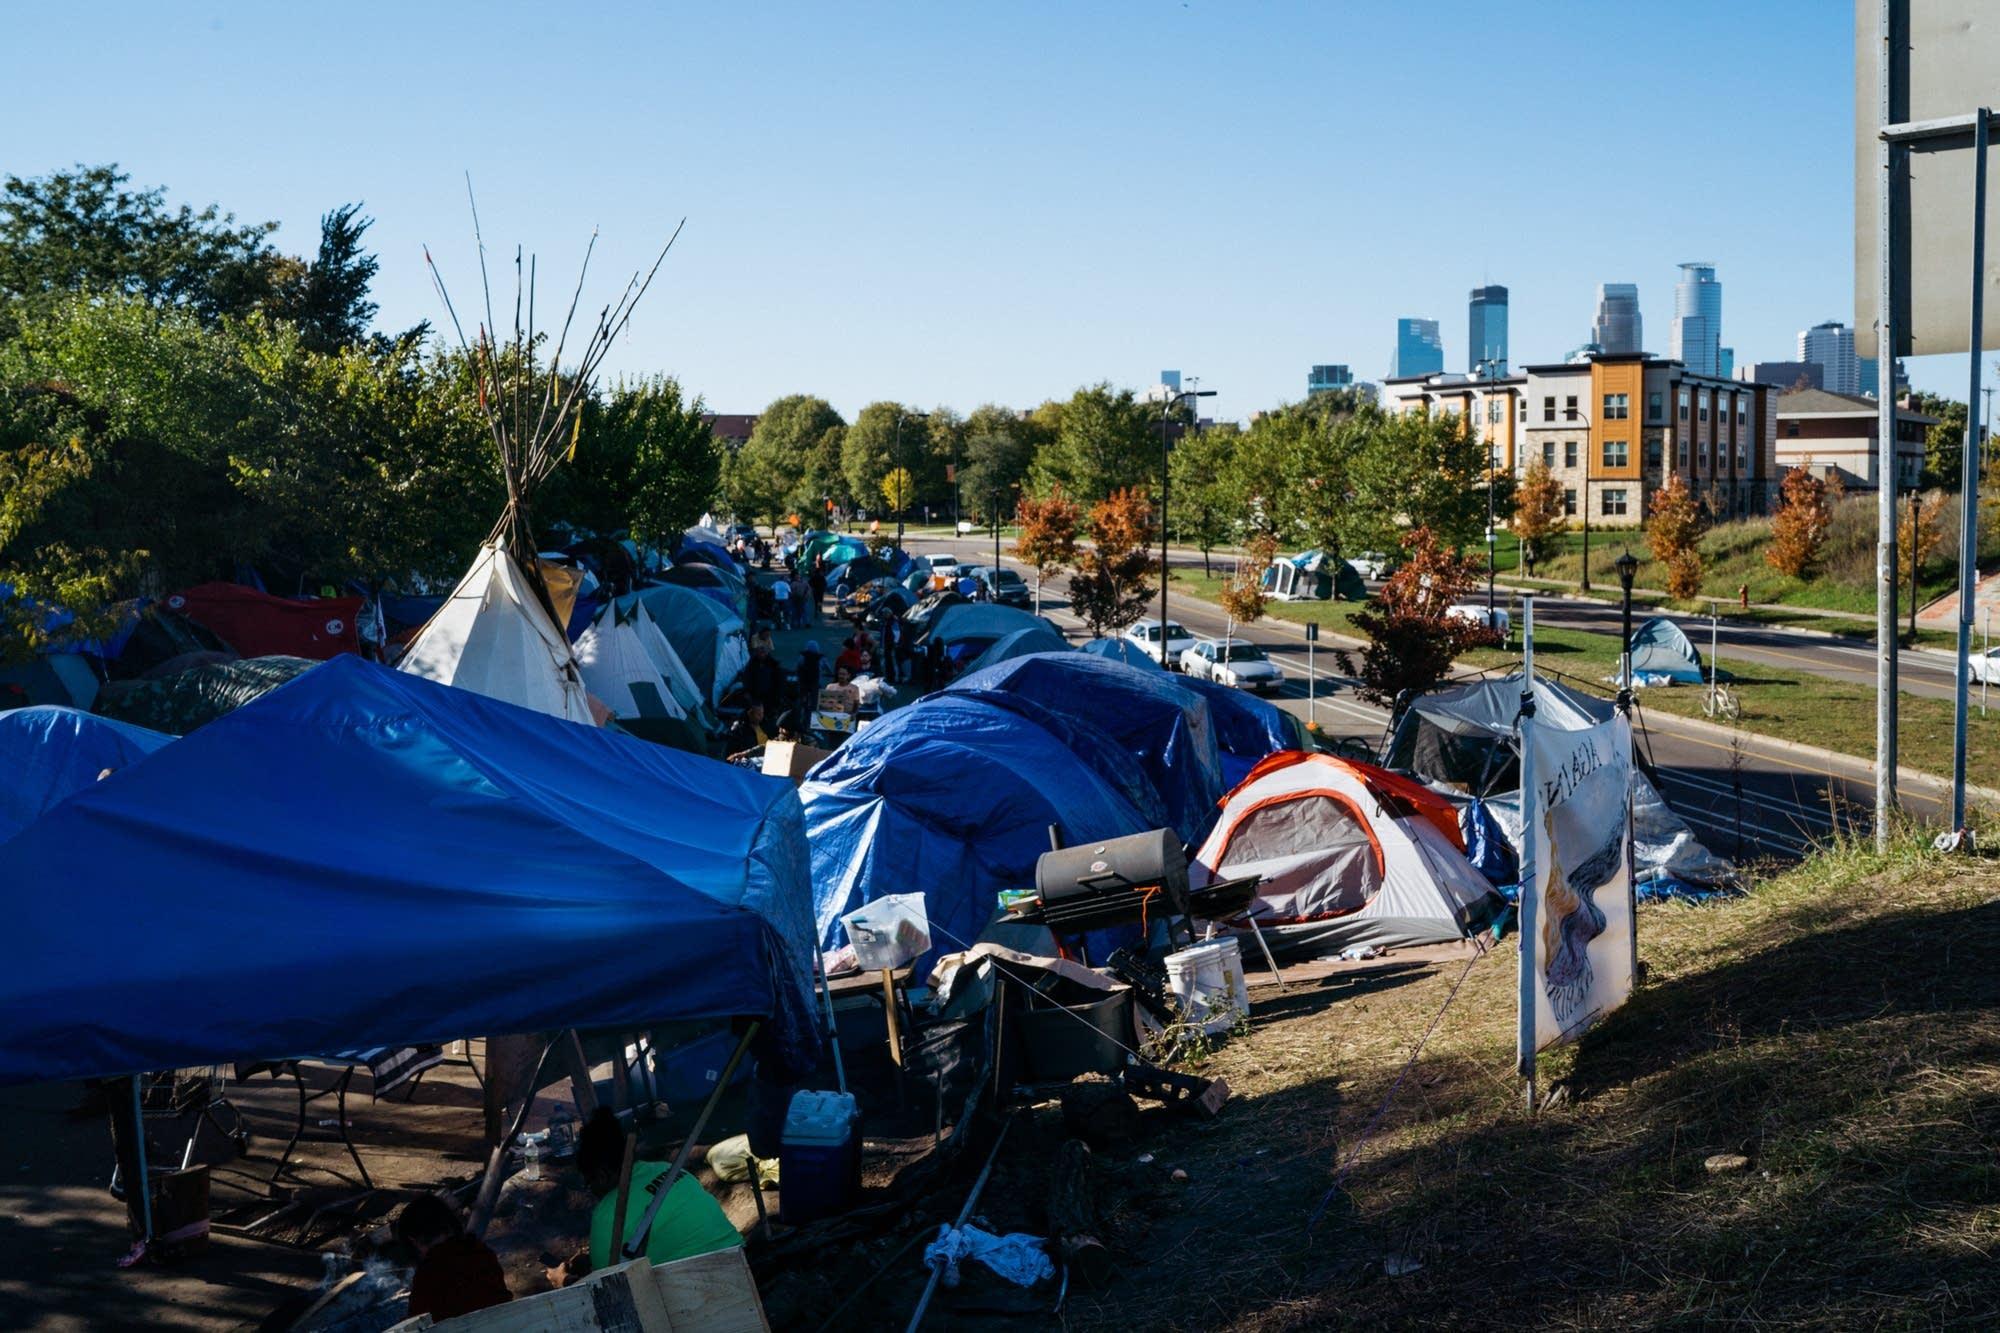 Tents fill a strip of land near Hiawatha Ave.